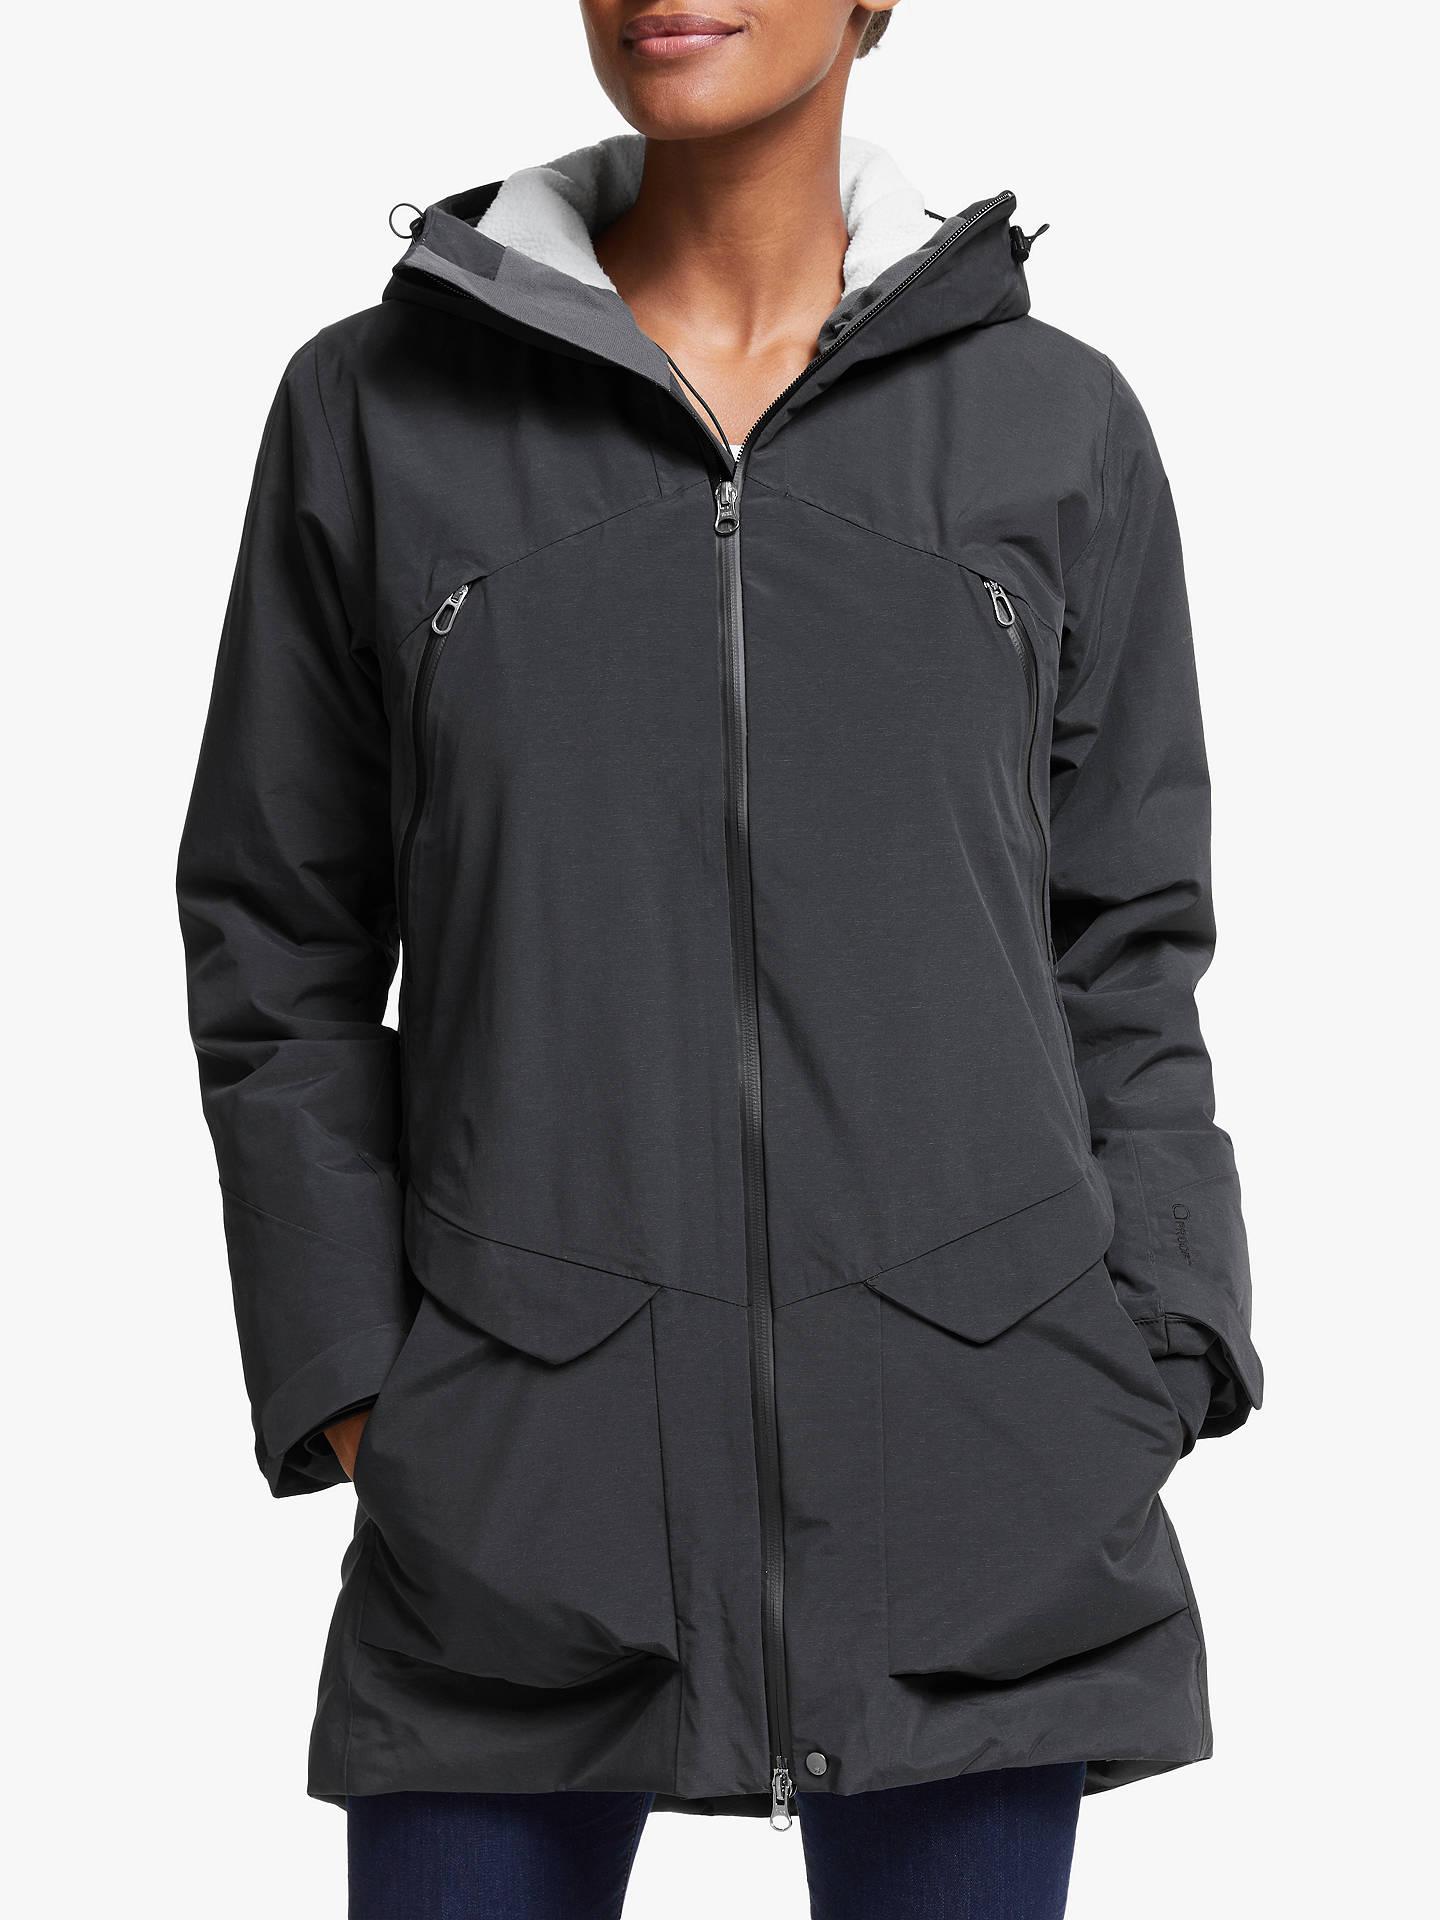 BuyHaglöfs Torsång Women s Waterproof Parka Jacket eb17785262